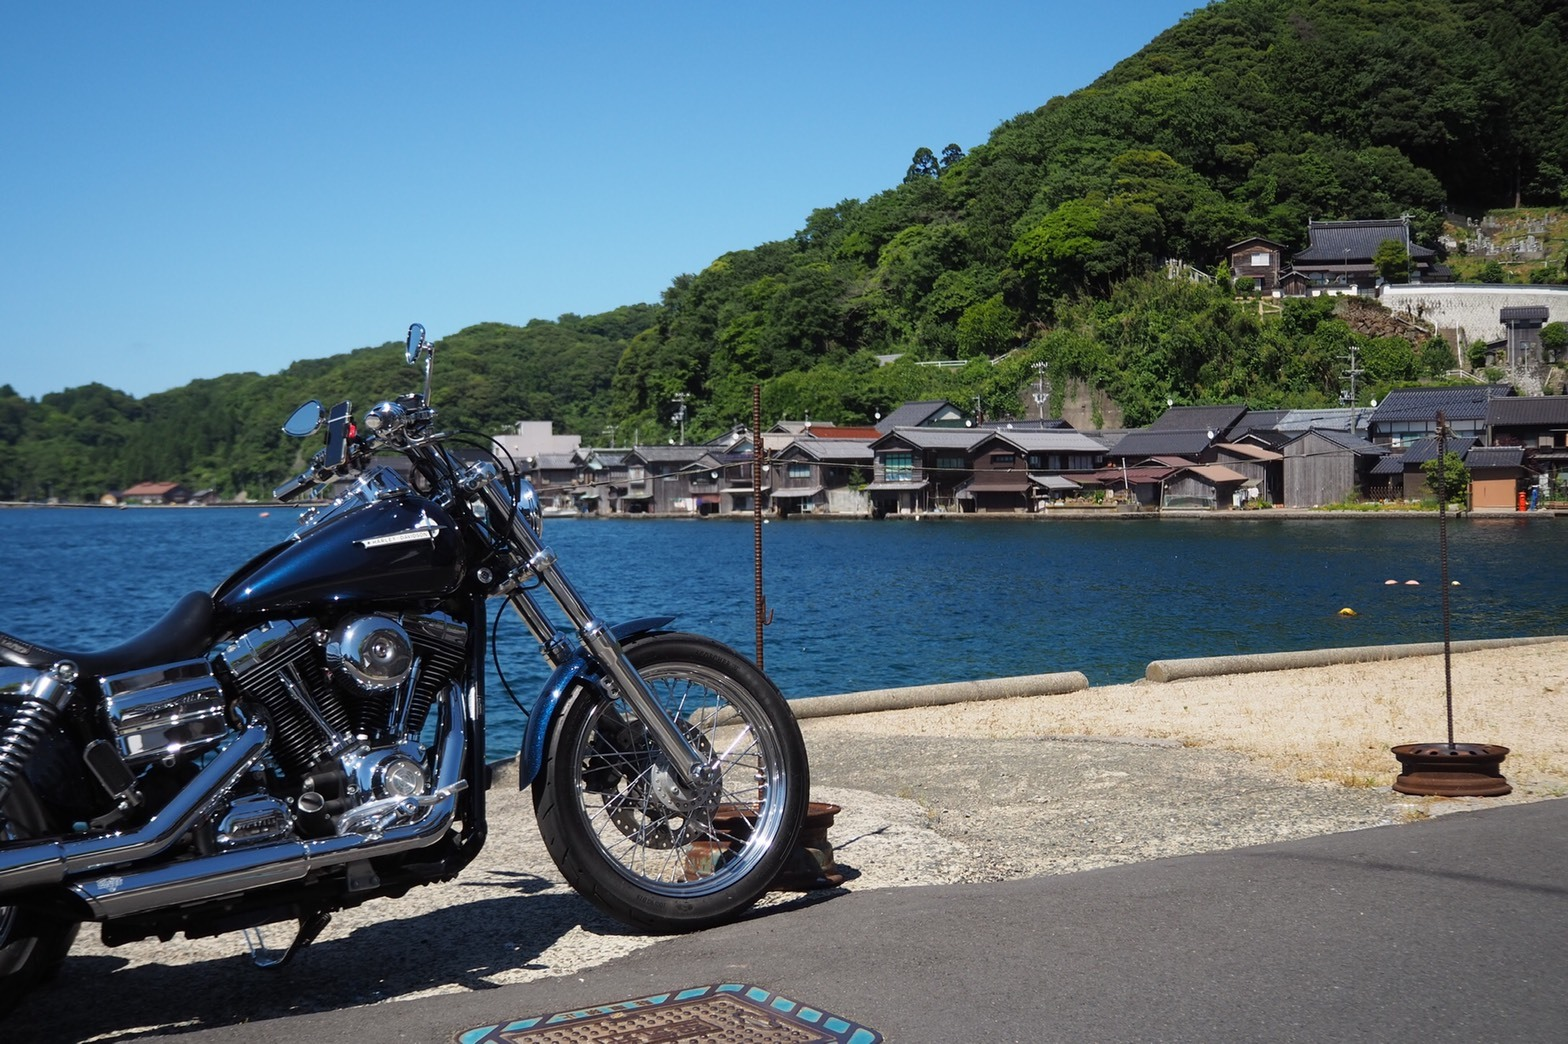 motorcycle-touring-blog-kyoto-tangopeninsula-ine-funaya-view.jpg